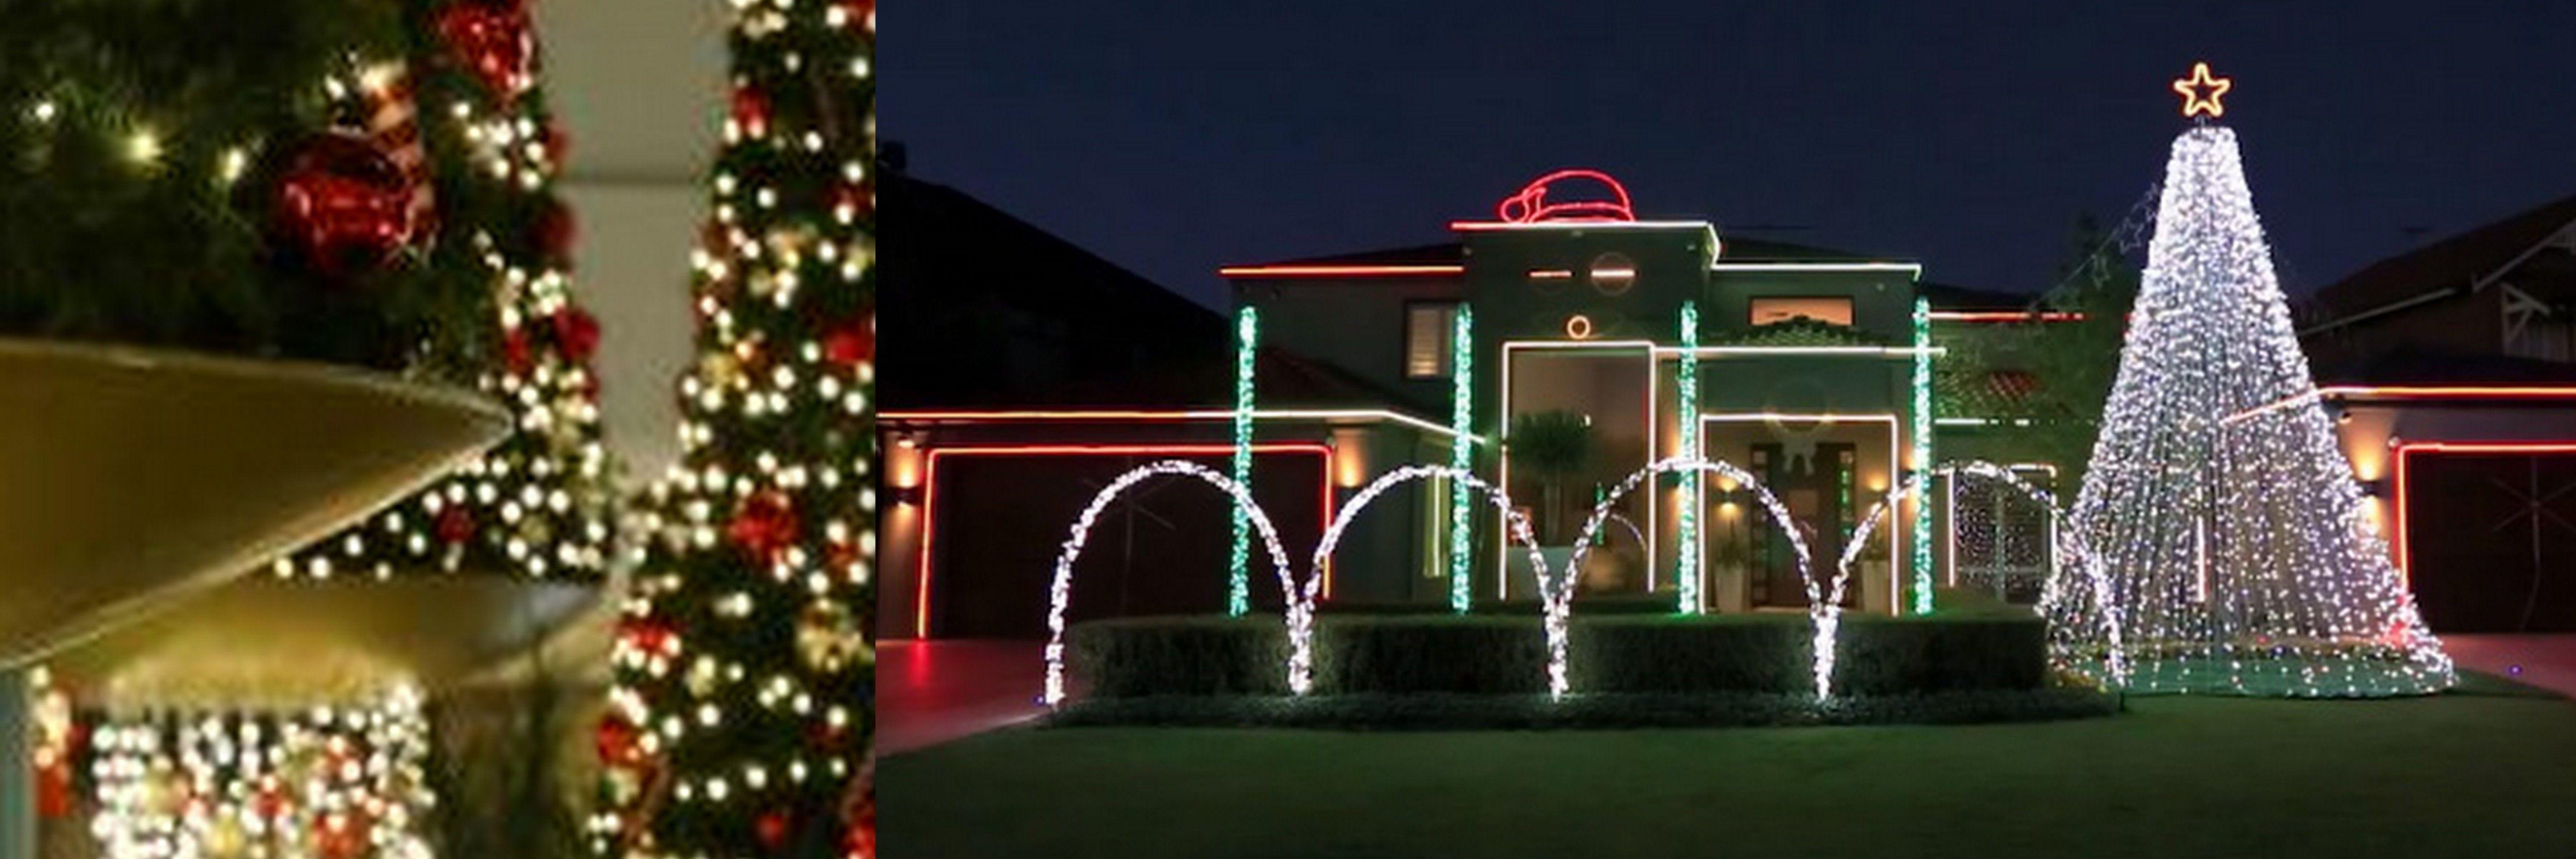 Best Solar Christmas Lights Reviews Outside House Christmas Lights Solar Powered Christmas Lights Solar Christmas Lights Decorating With Christmas Lights